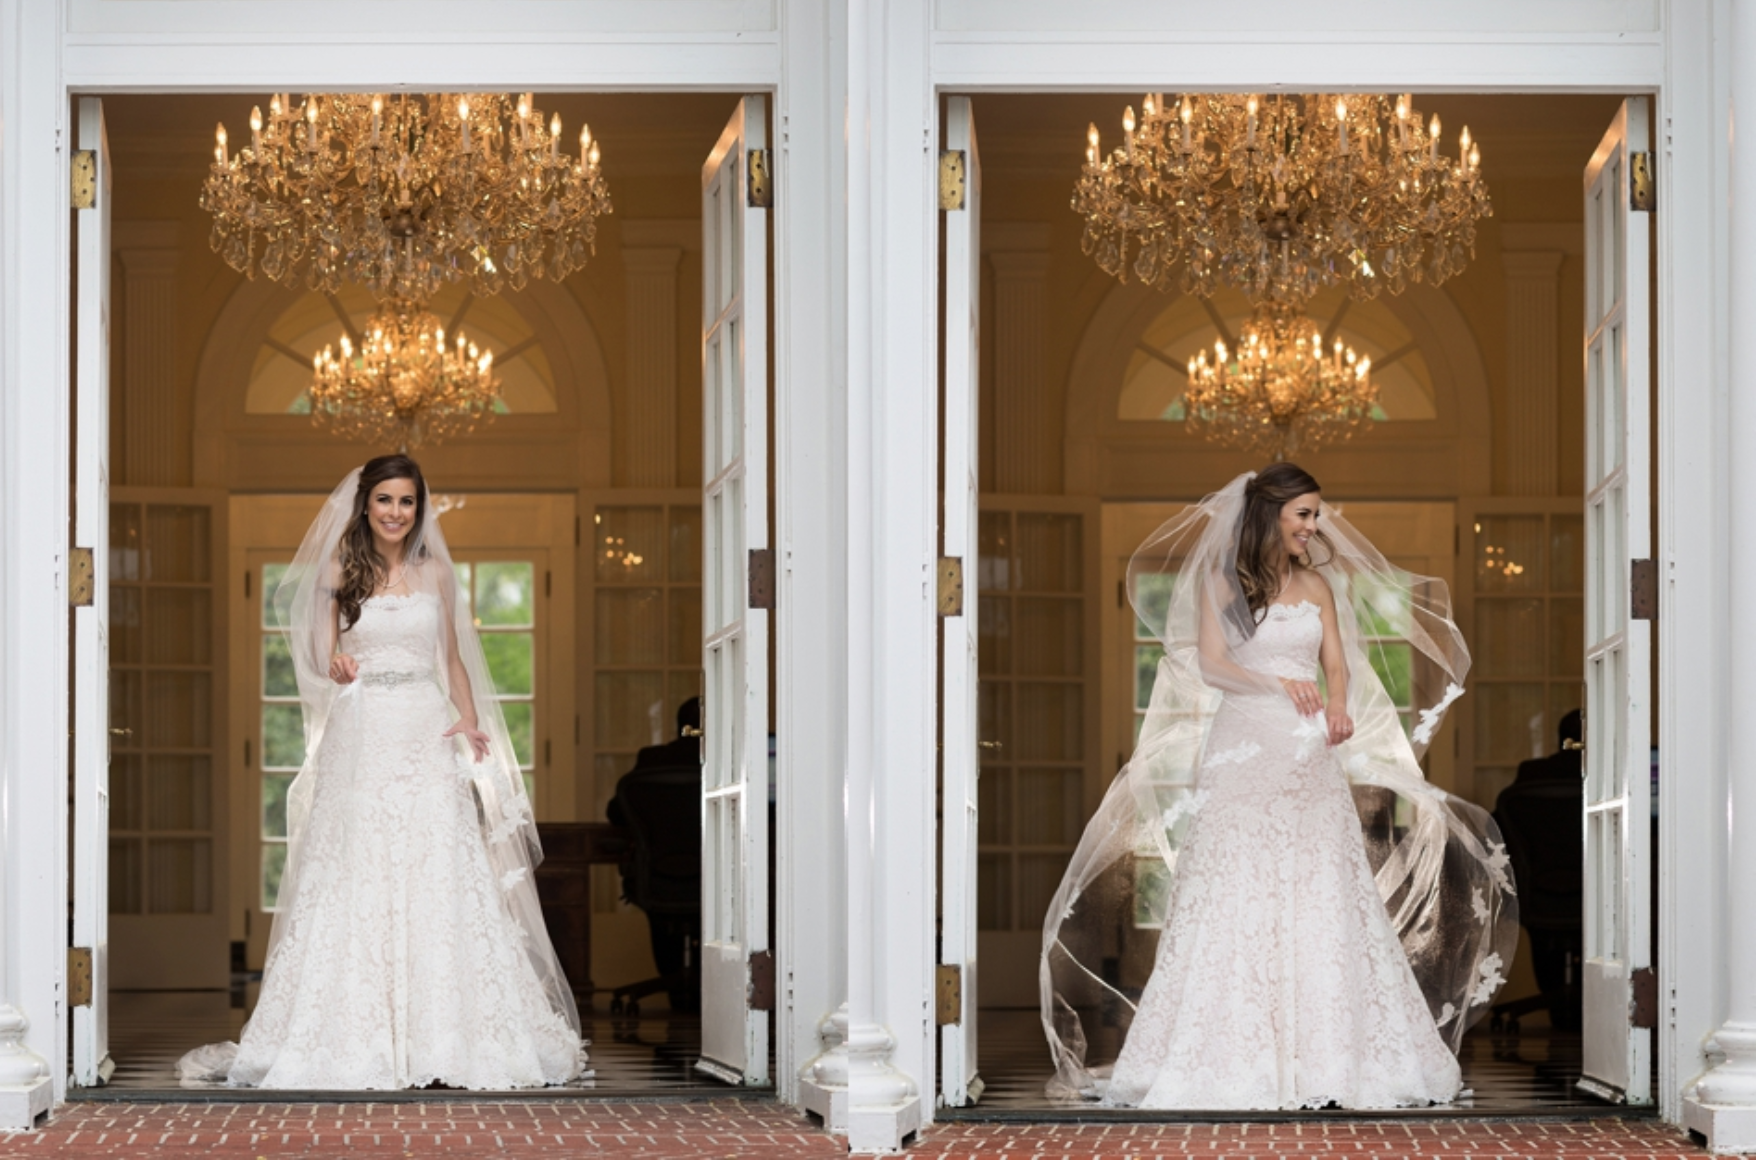 Duke Mansion in Charlotte, NCBLOG POSTBridal Portraits by Elly @ The Duke Mansion -